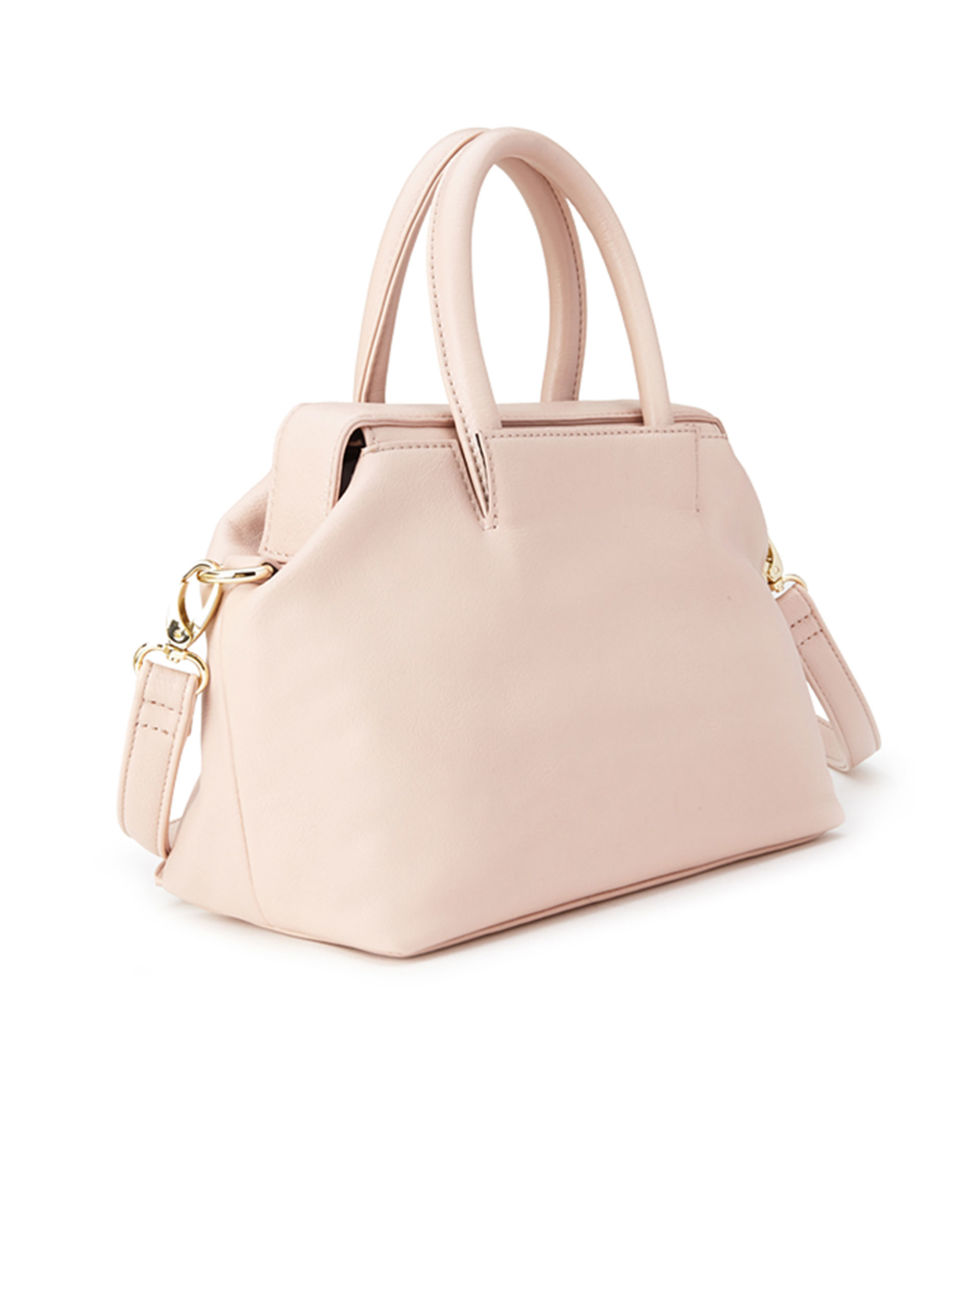 Handbags Forever 21 Dress Images